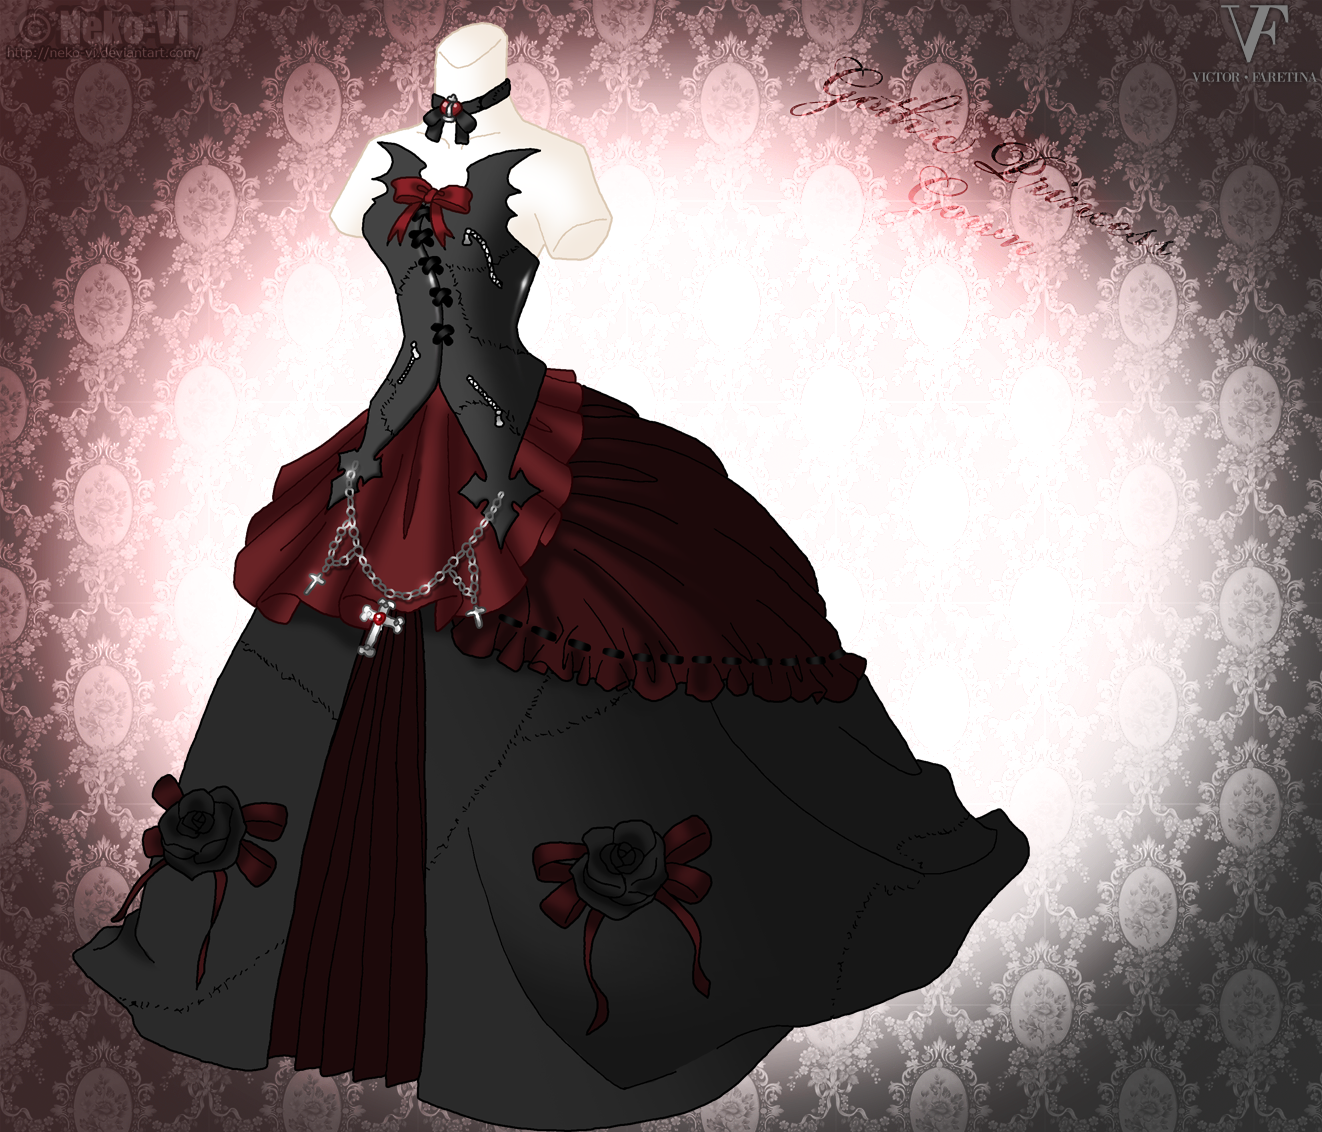 Gothic Princess Gown by Neko-Vi